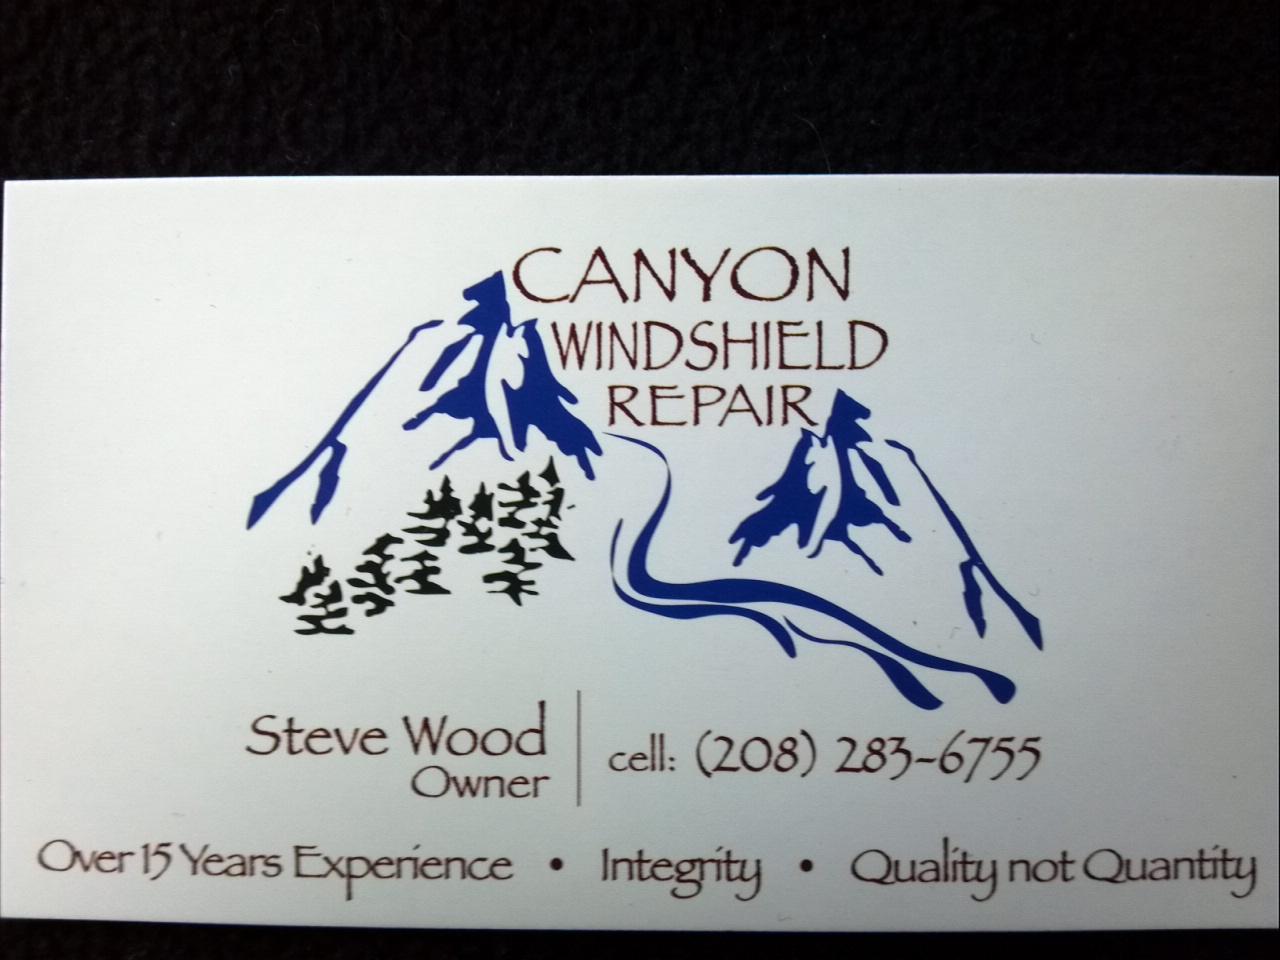 Canyon Windshield Repair